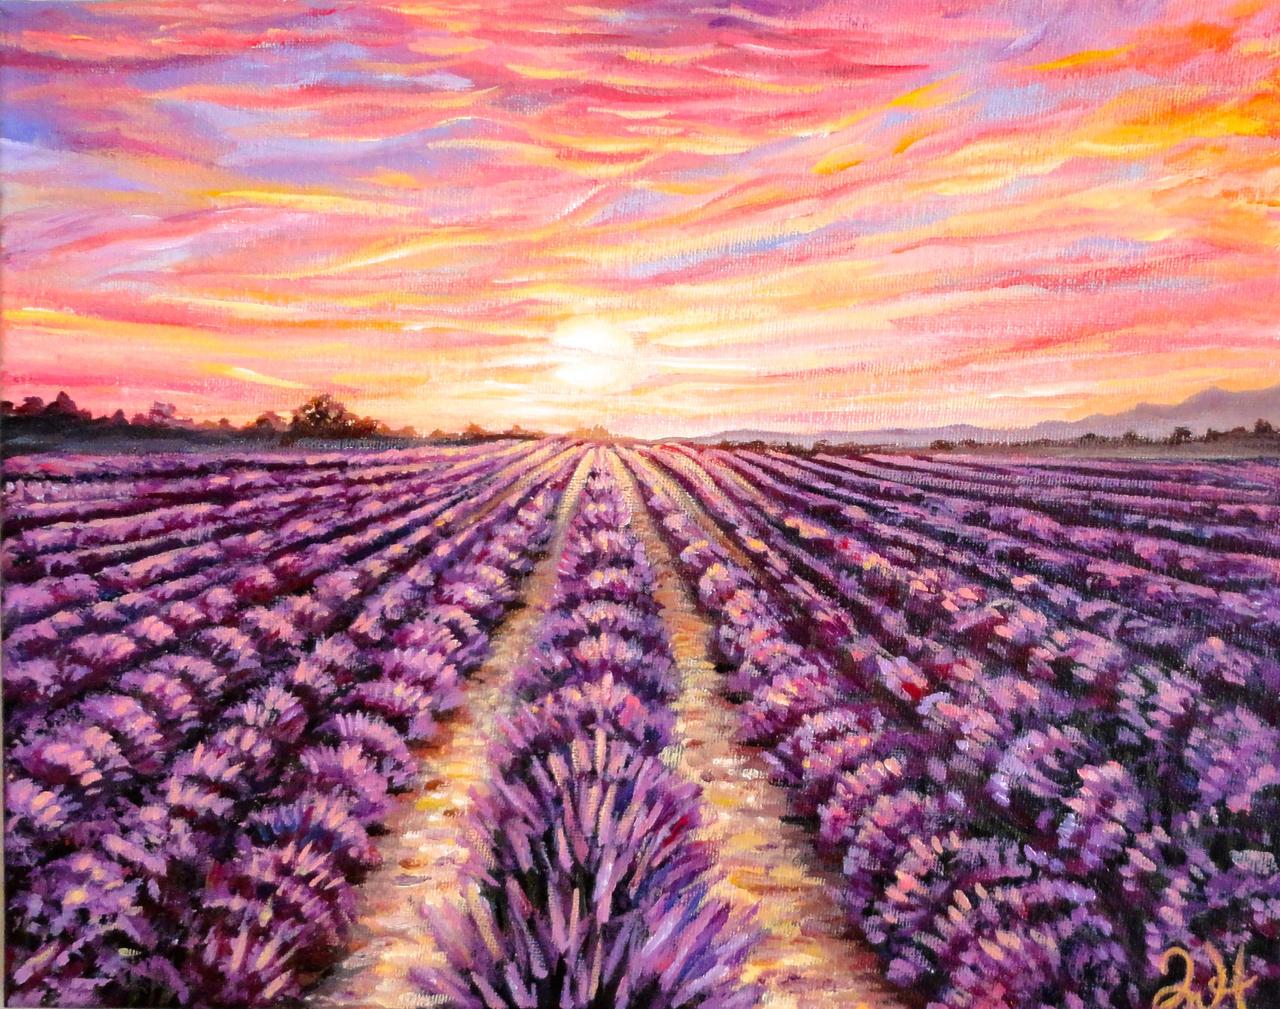 Provence Lavender Field at Sunset by Manukahoney7 on DeviantArtAcrylic Paintings Sunset